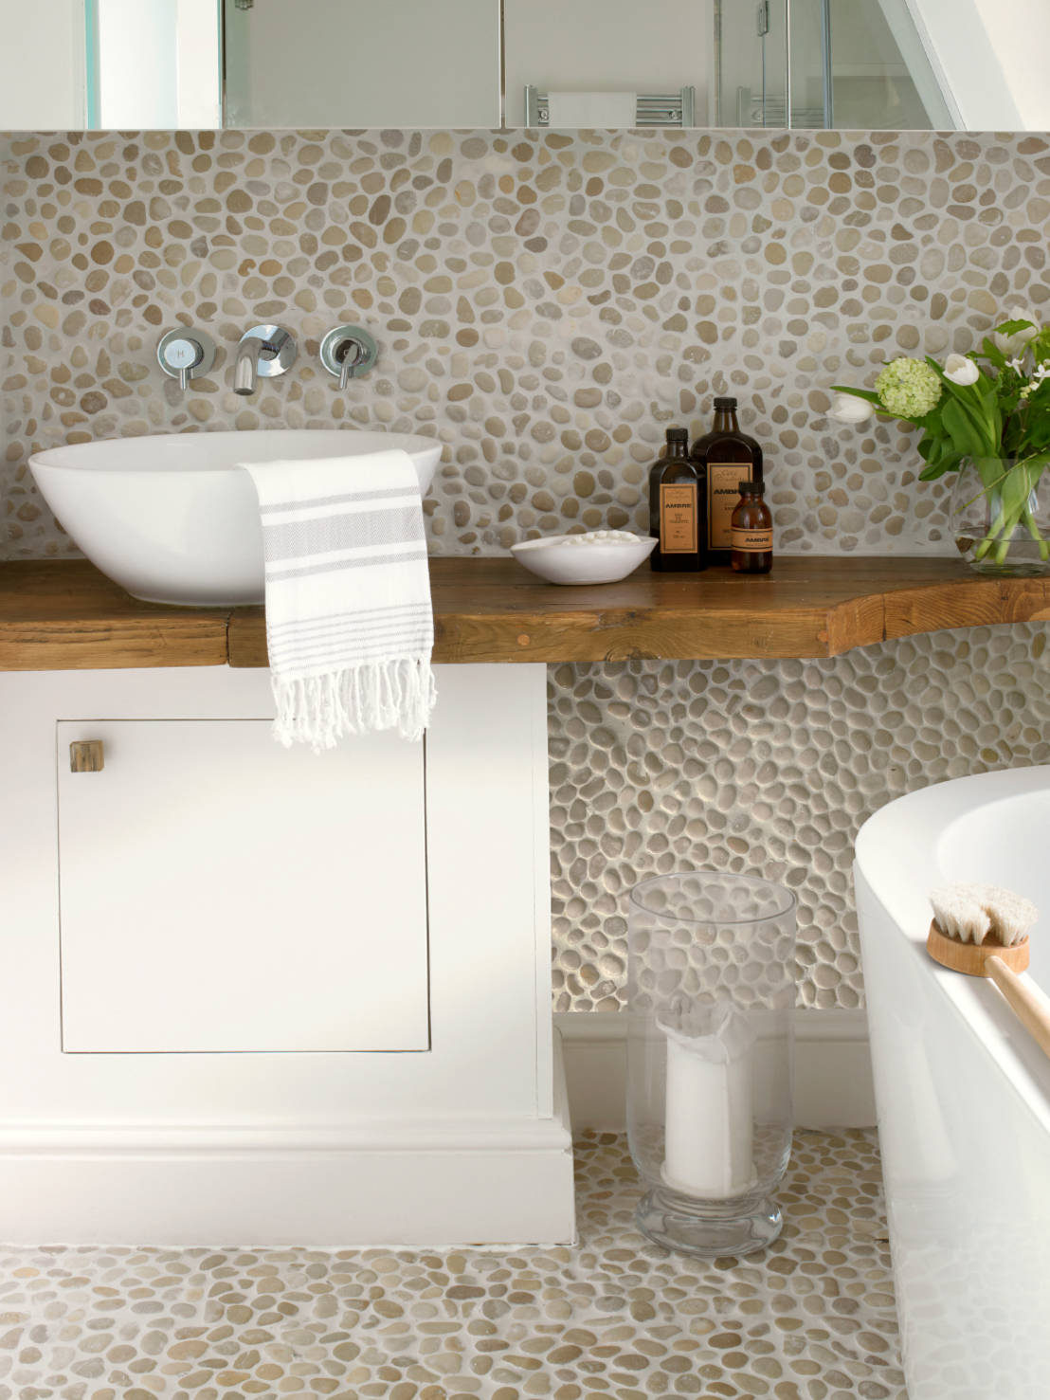 14 trucchi per una casa pulita in modo maniacale - Casa pulita e profumata ...